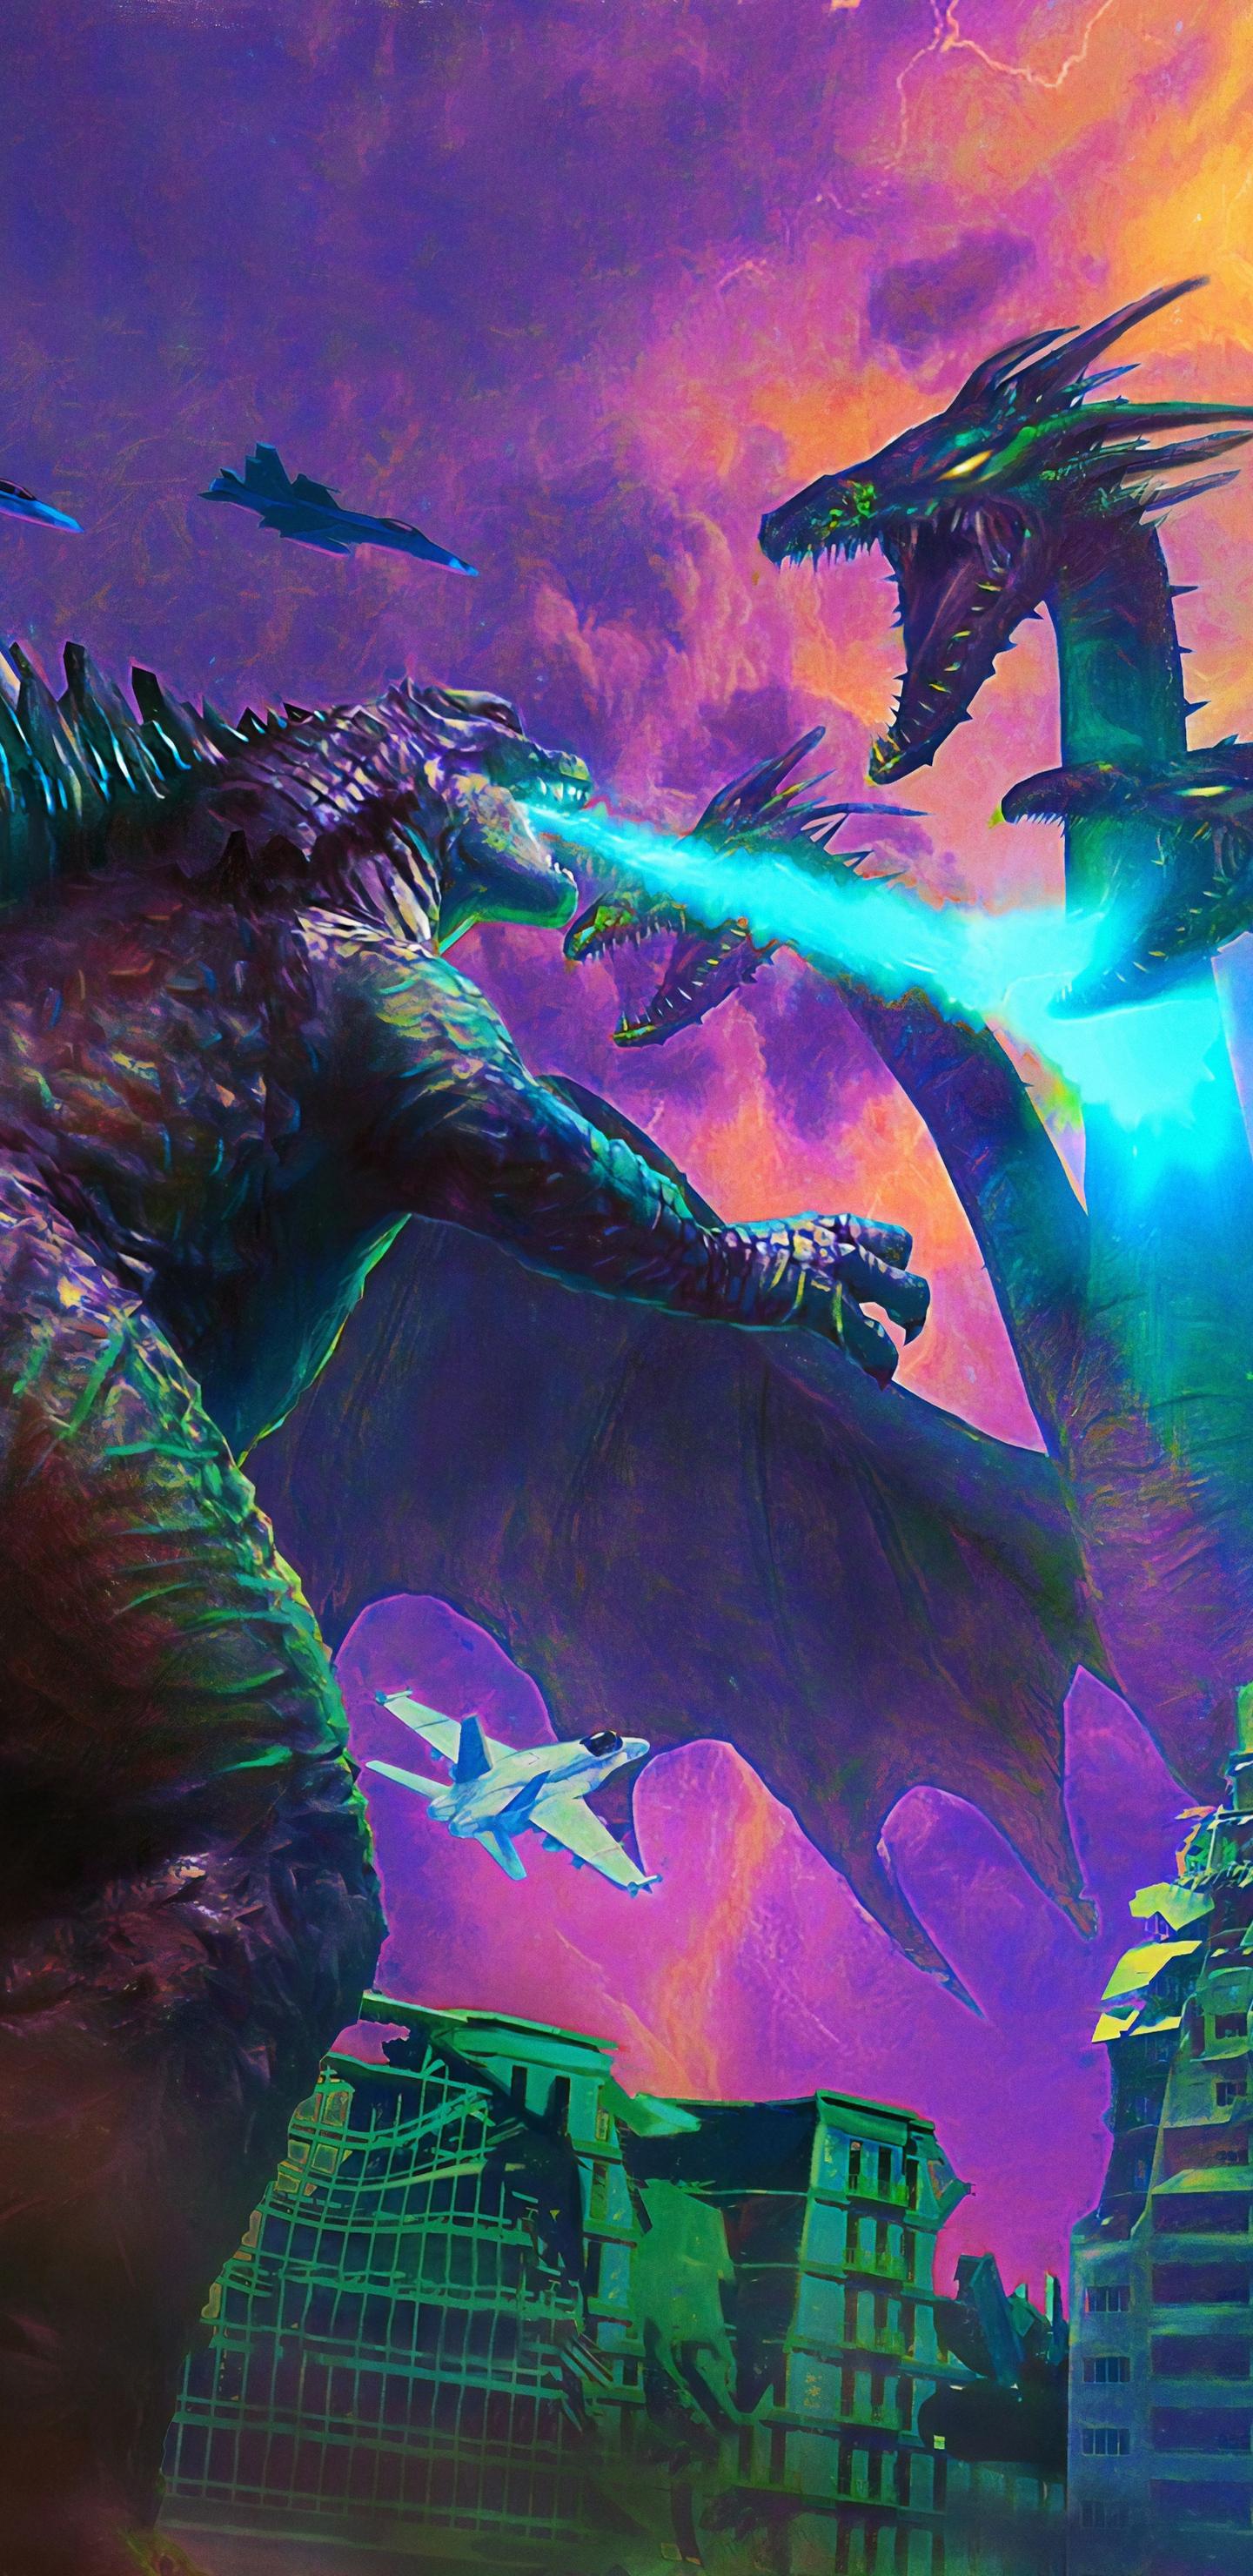 1440x2960 Poster Art Godzilla King Of The Monsters Samsung Galaxy